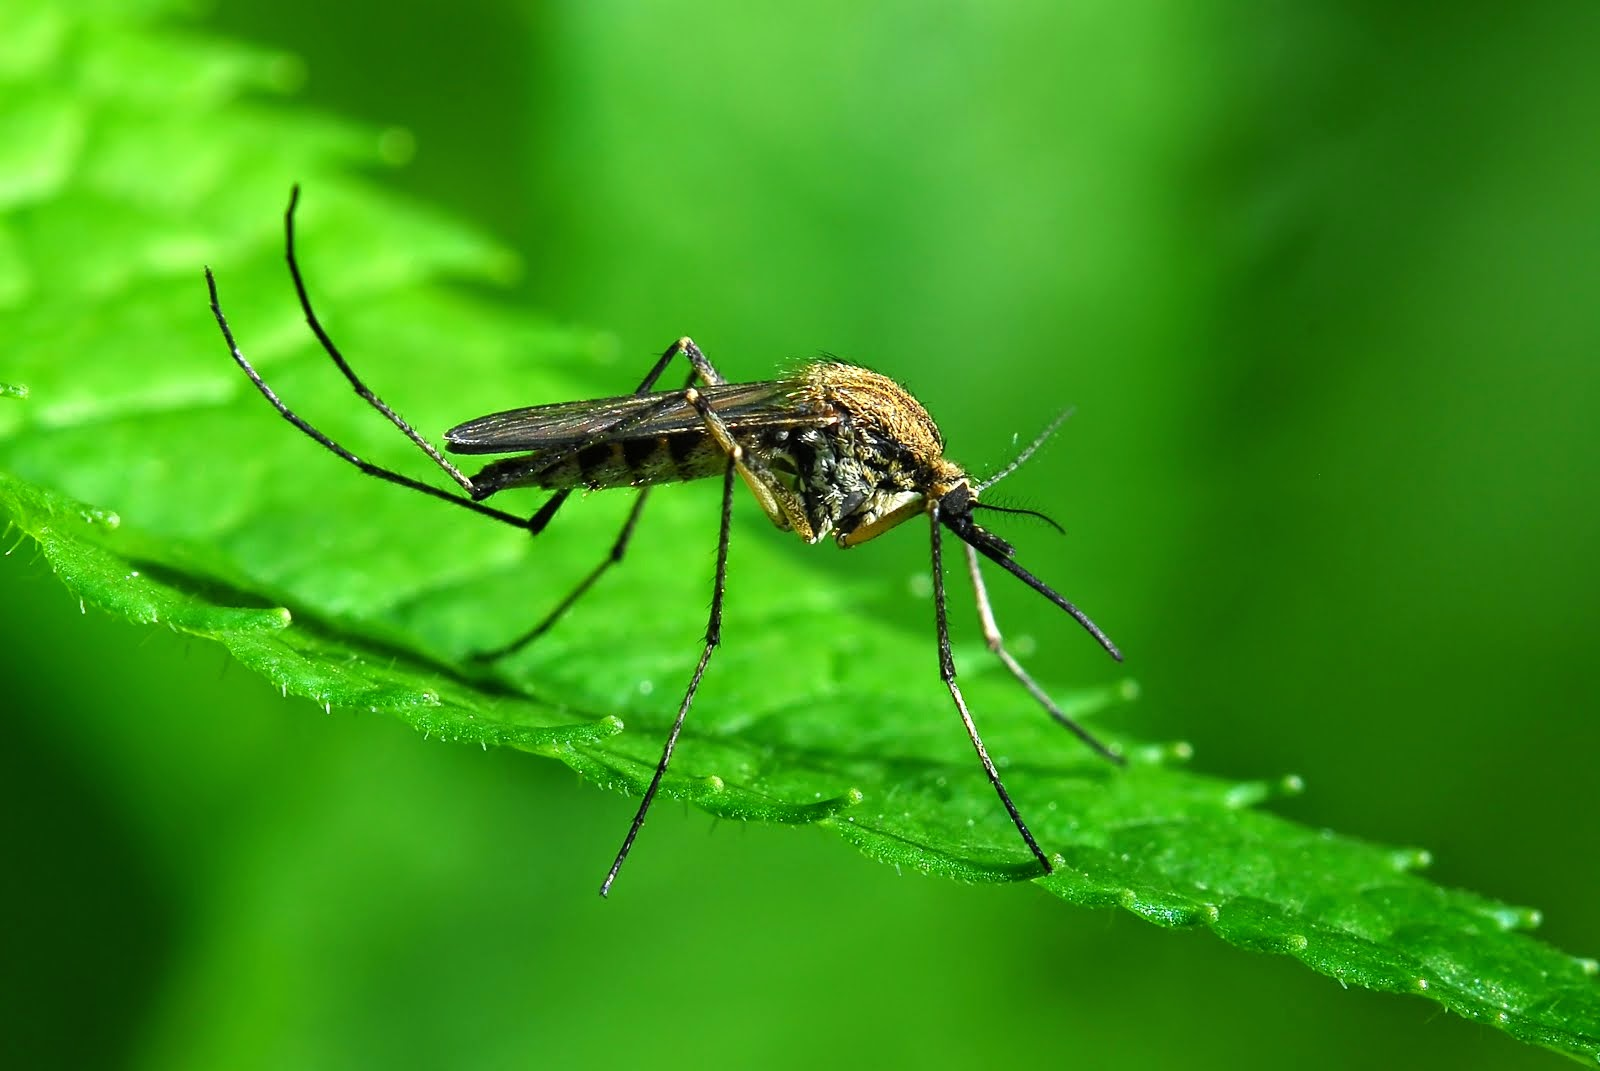 Los Mosquitos: Anatomia